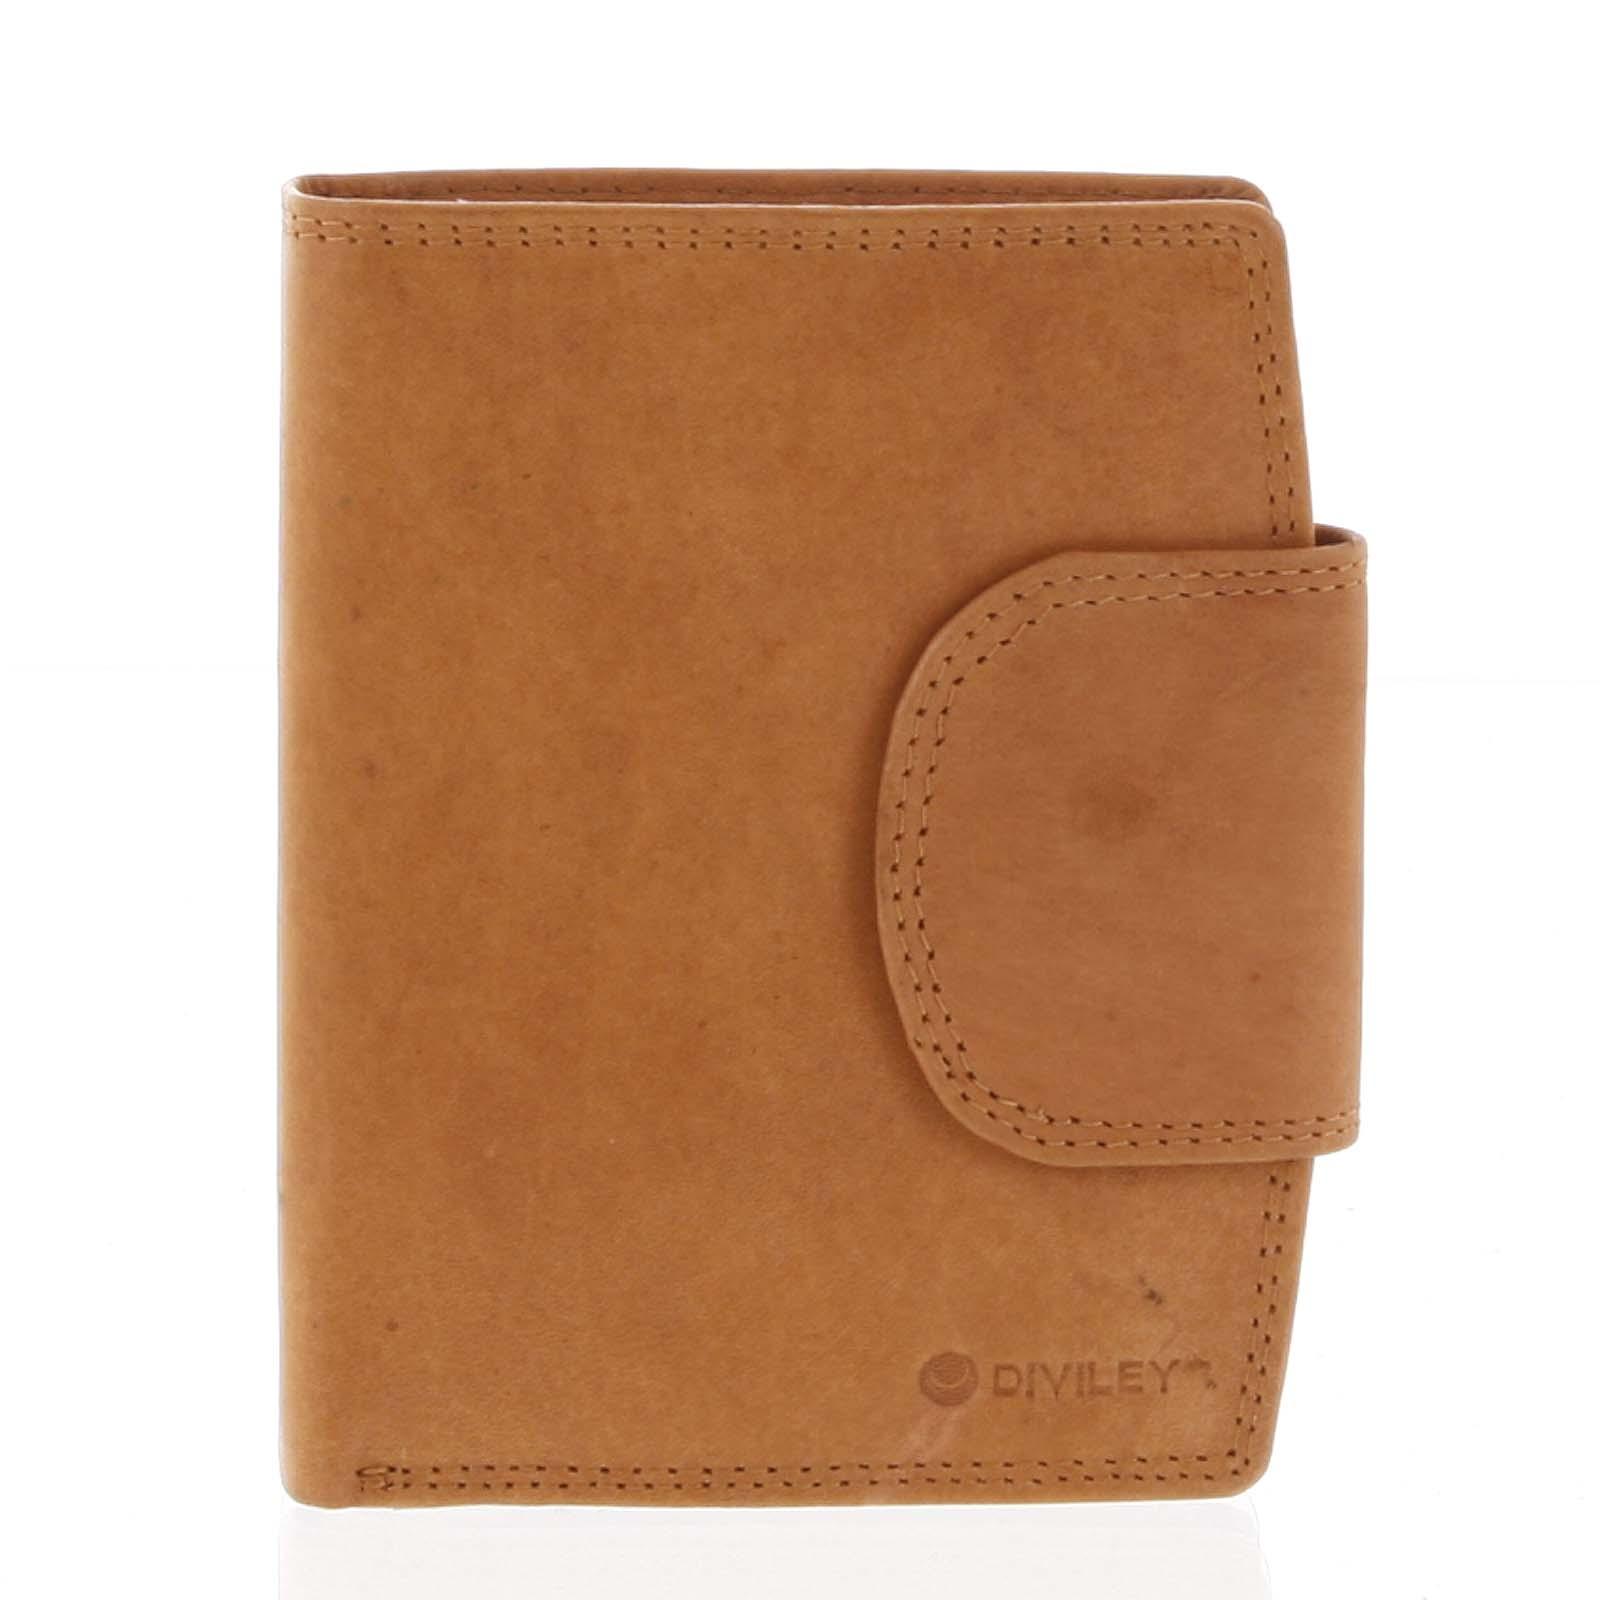 Elegantná koňaková kožená peňaženka so zápinkou - Diviley Universit